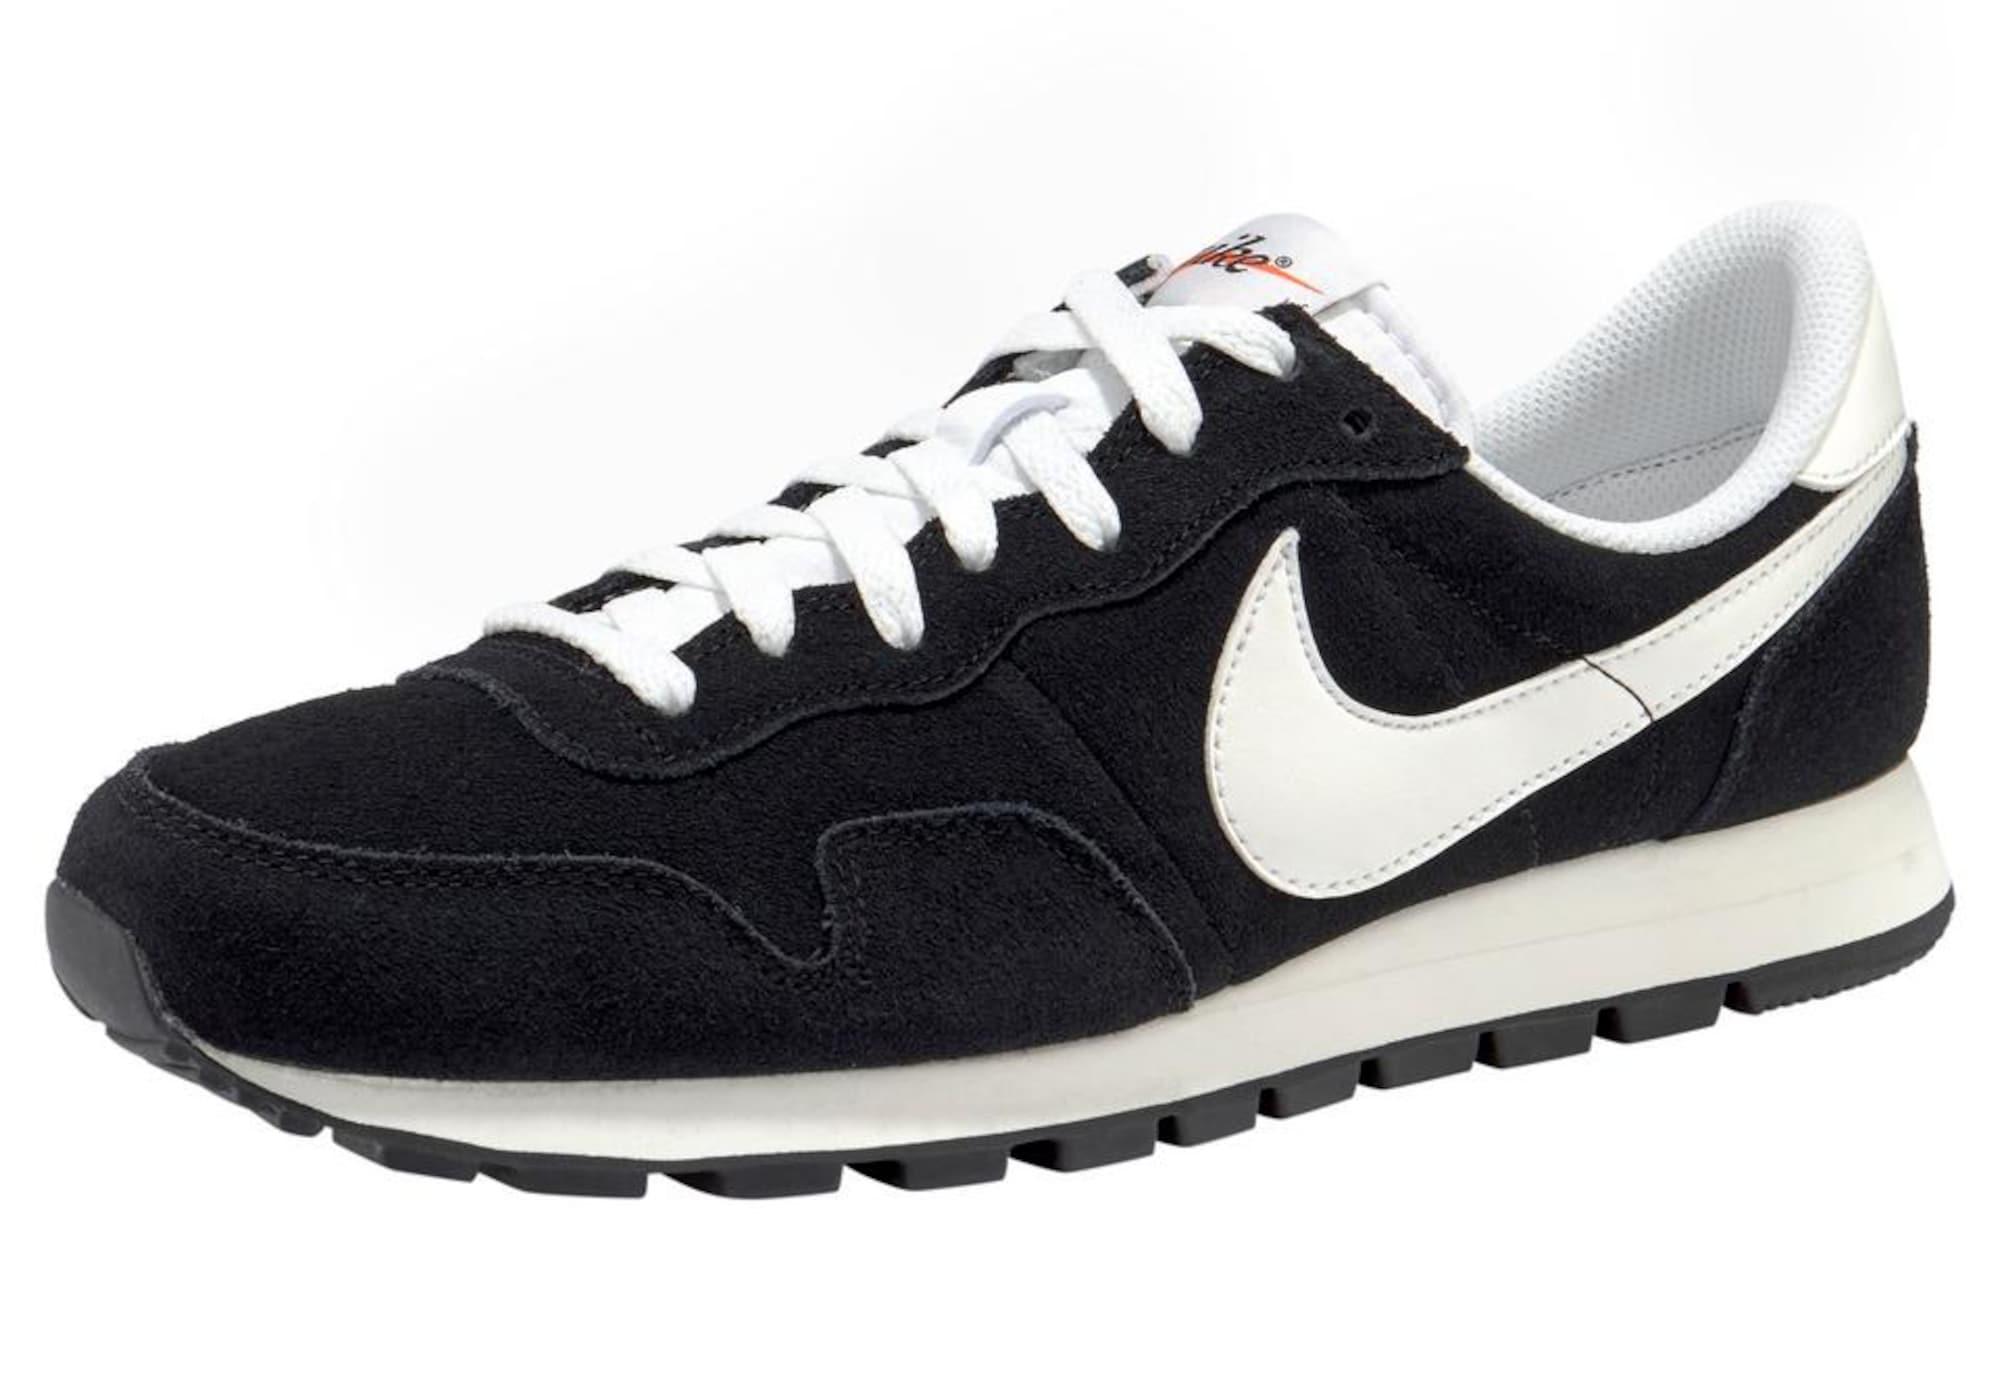 Tenisky Air Pegasus 83 černá bílá Nike Sportswear